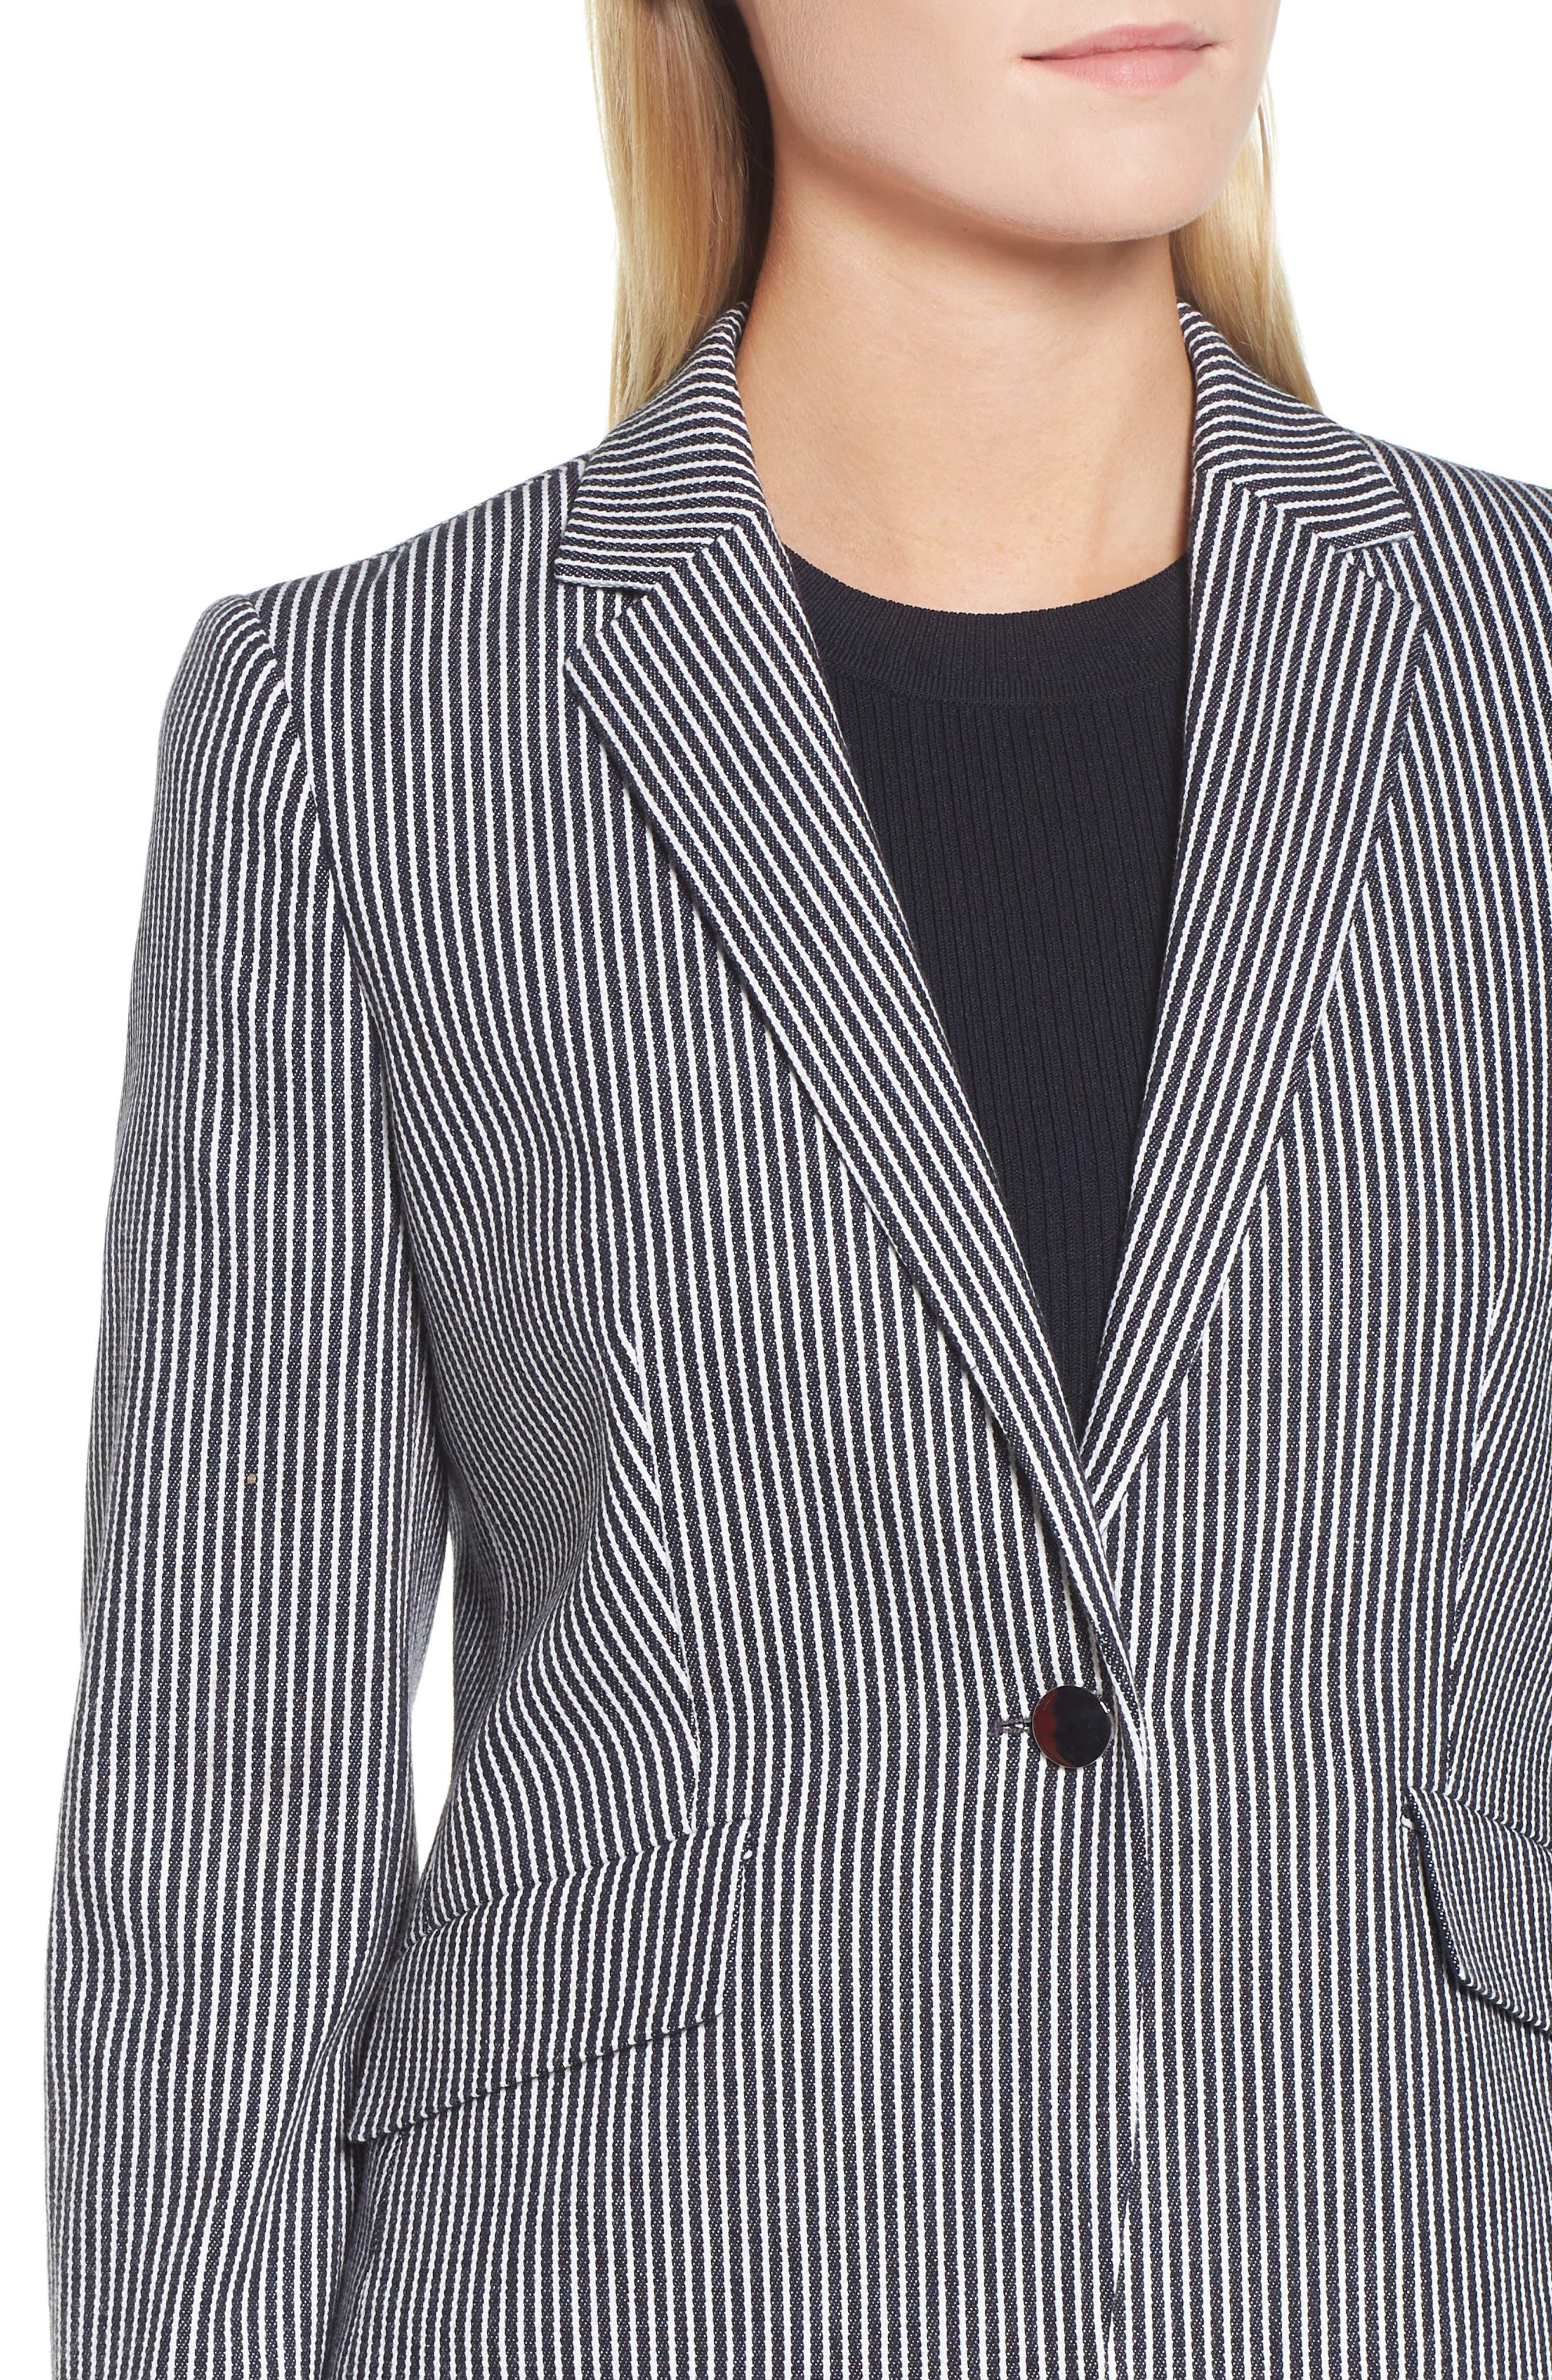 Katemika Stripe Stretch Cotton Suit Jacket,                             Alternate thumbnail 4, color,                             Navy Fantasy